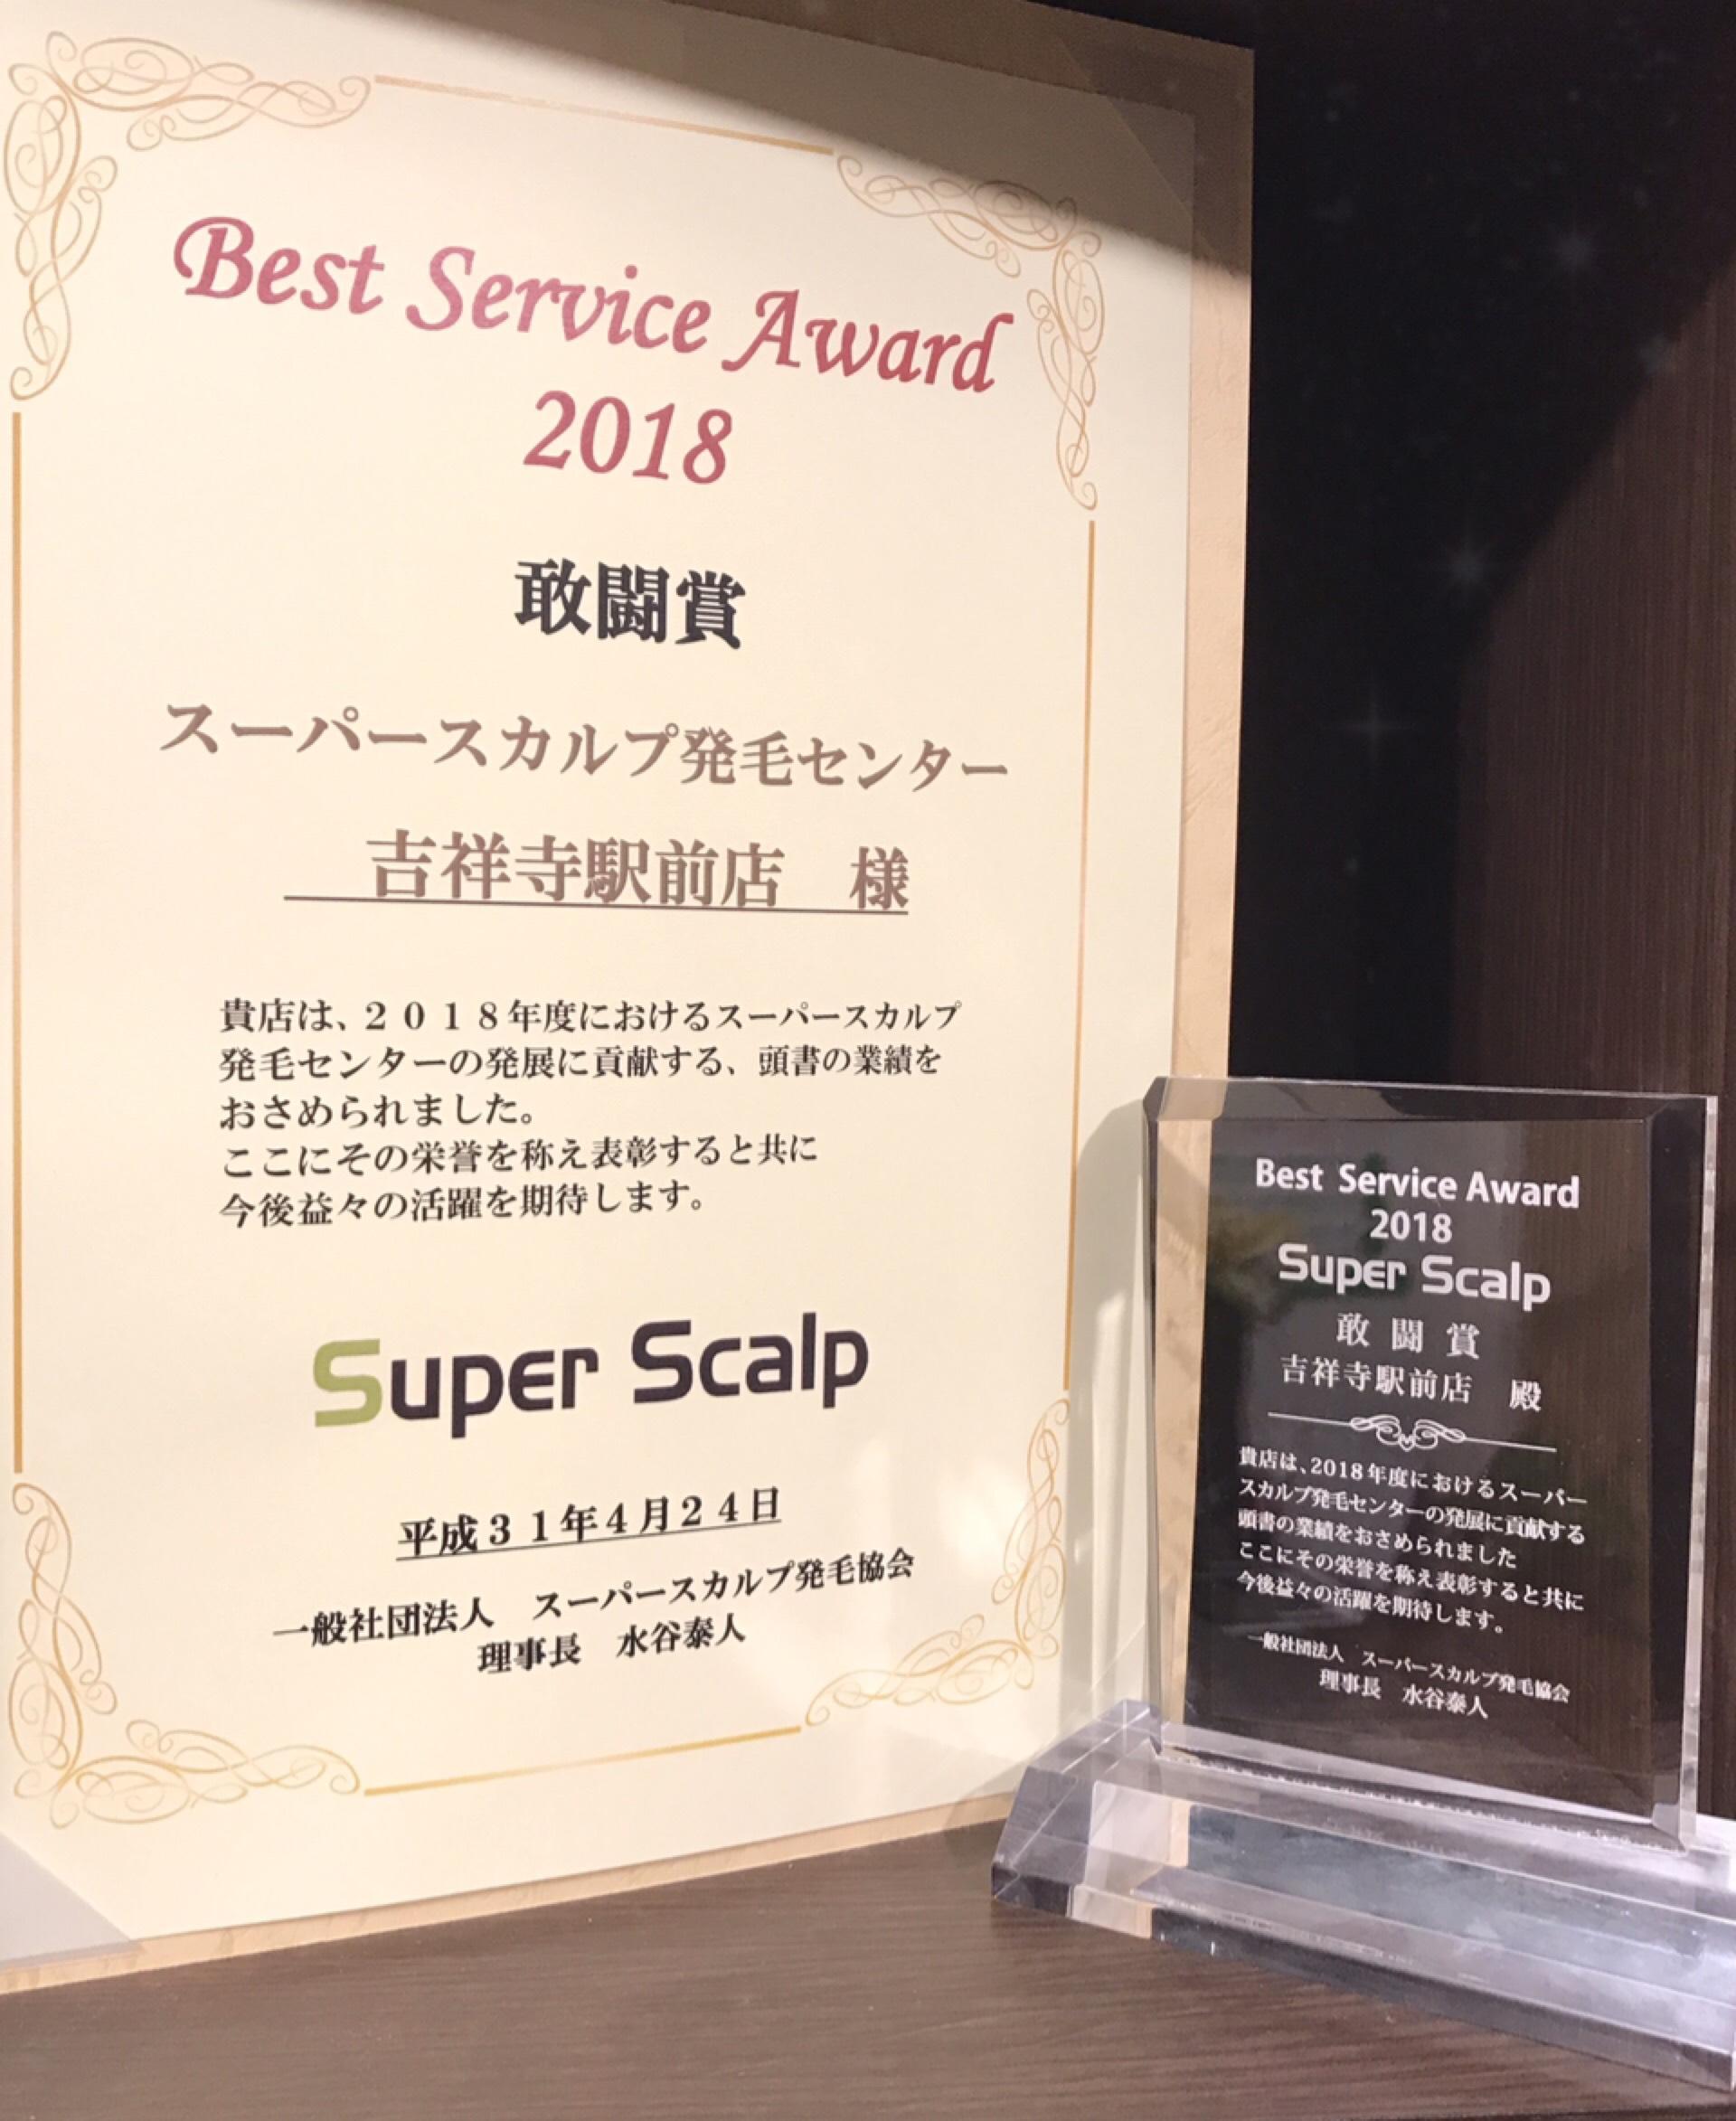 AGA 治療 東京 スーパースカルプ発毛センター吉祥寺駅前店 店内